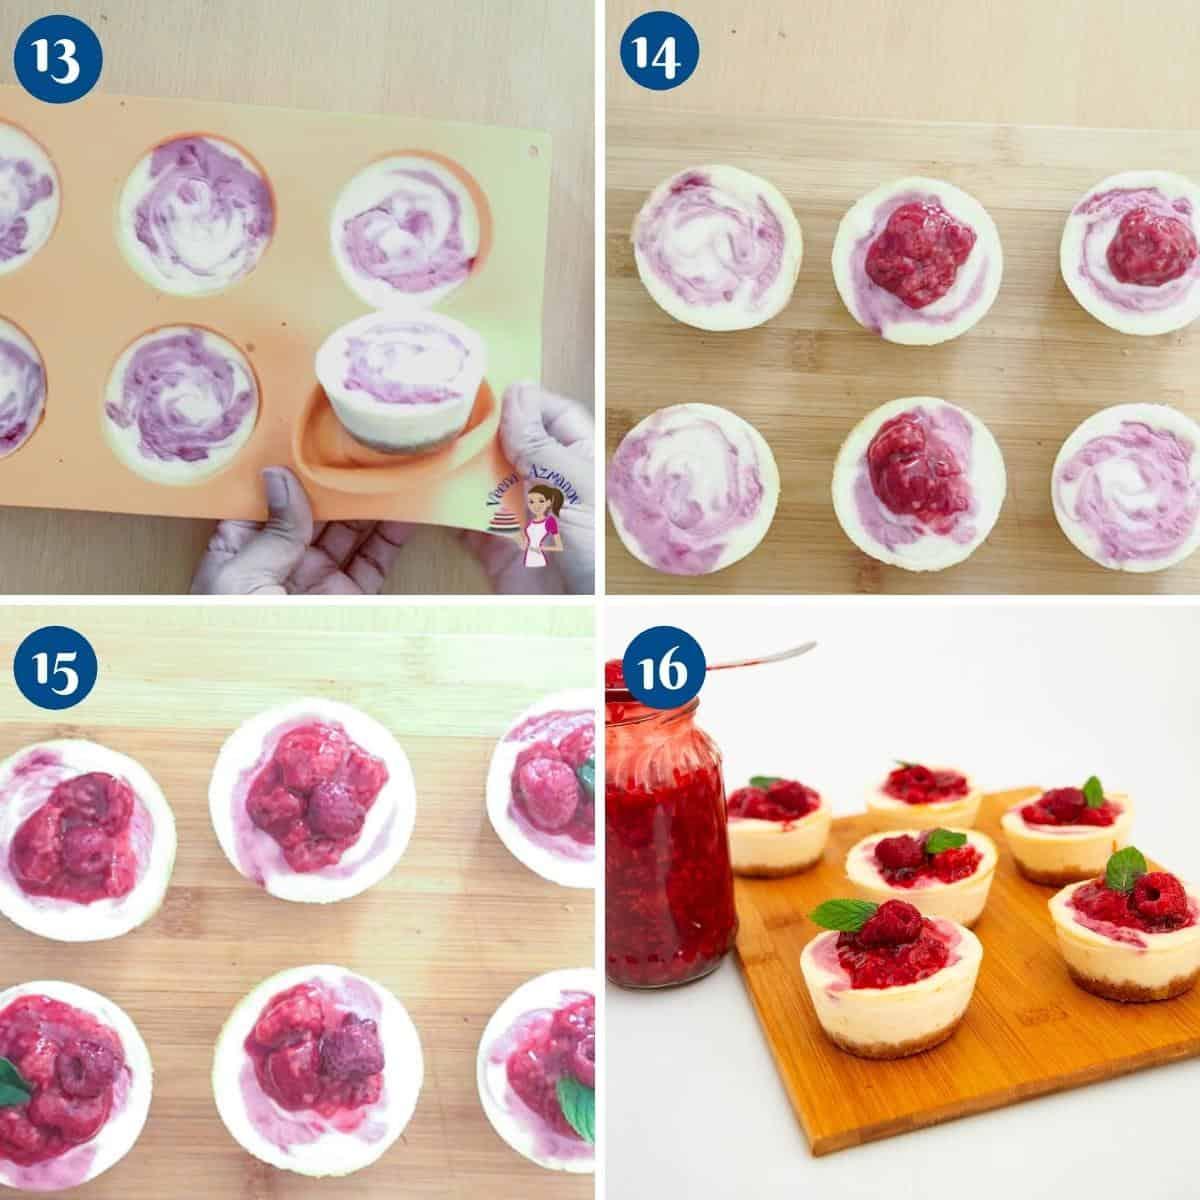 Progress pictures creating raspberry swirl on mini cheesecakes.